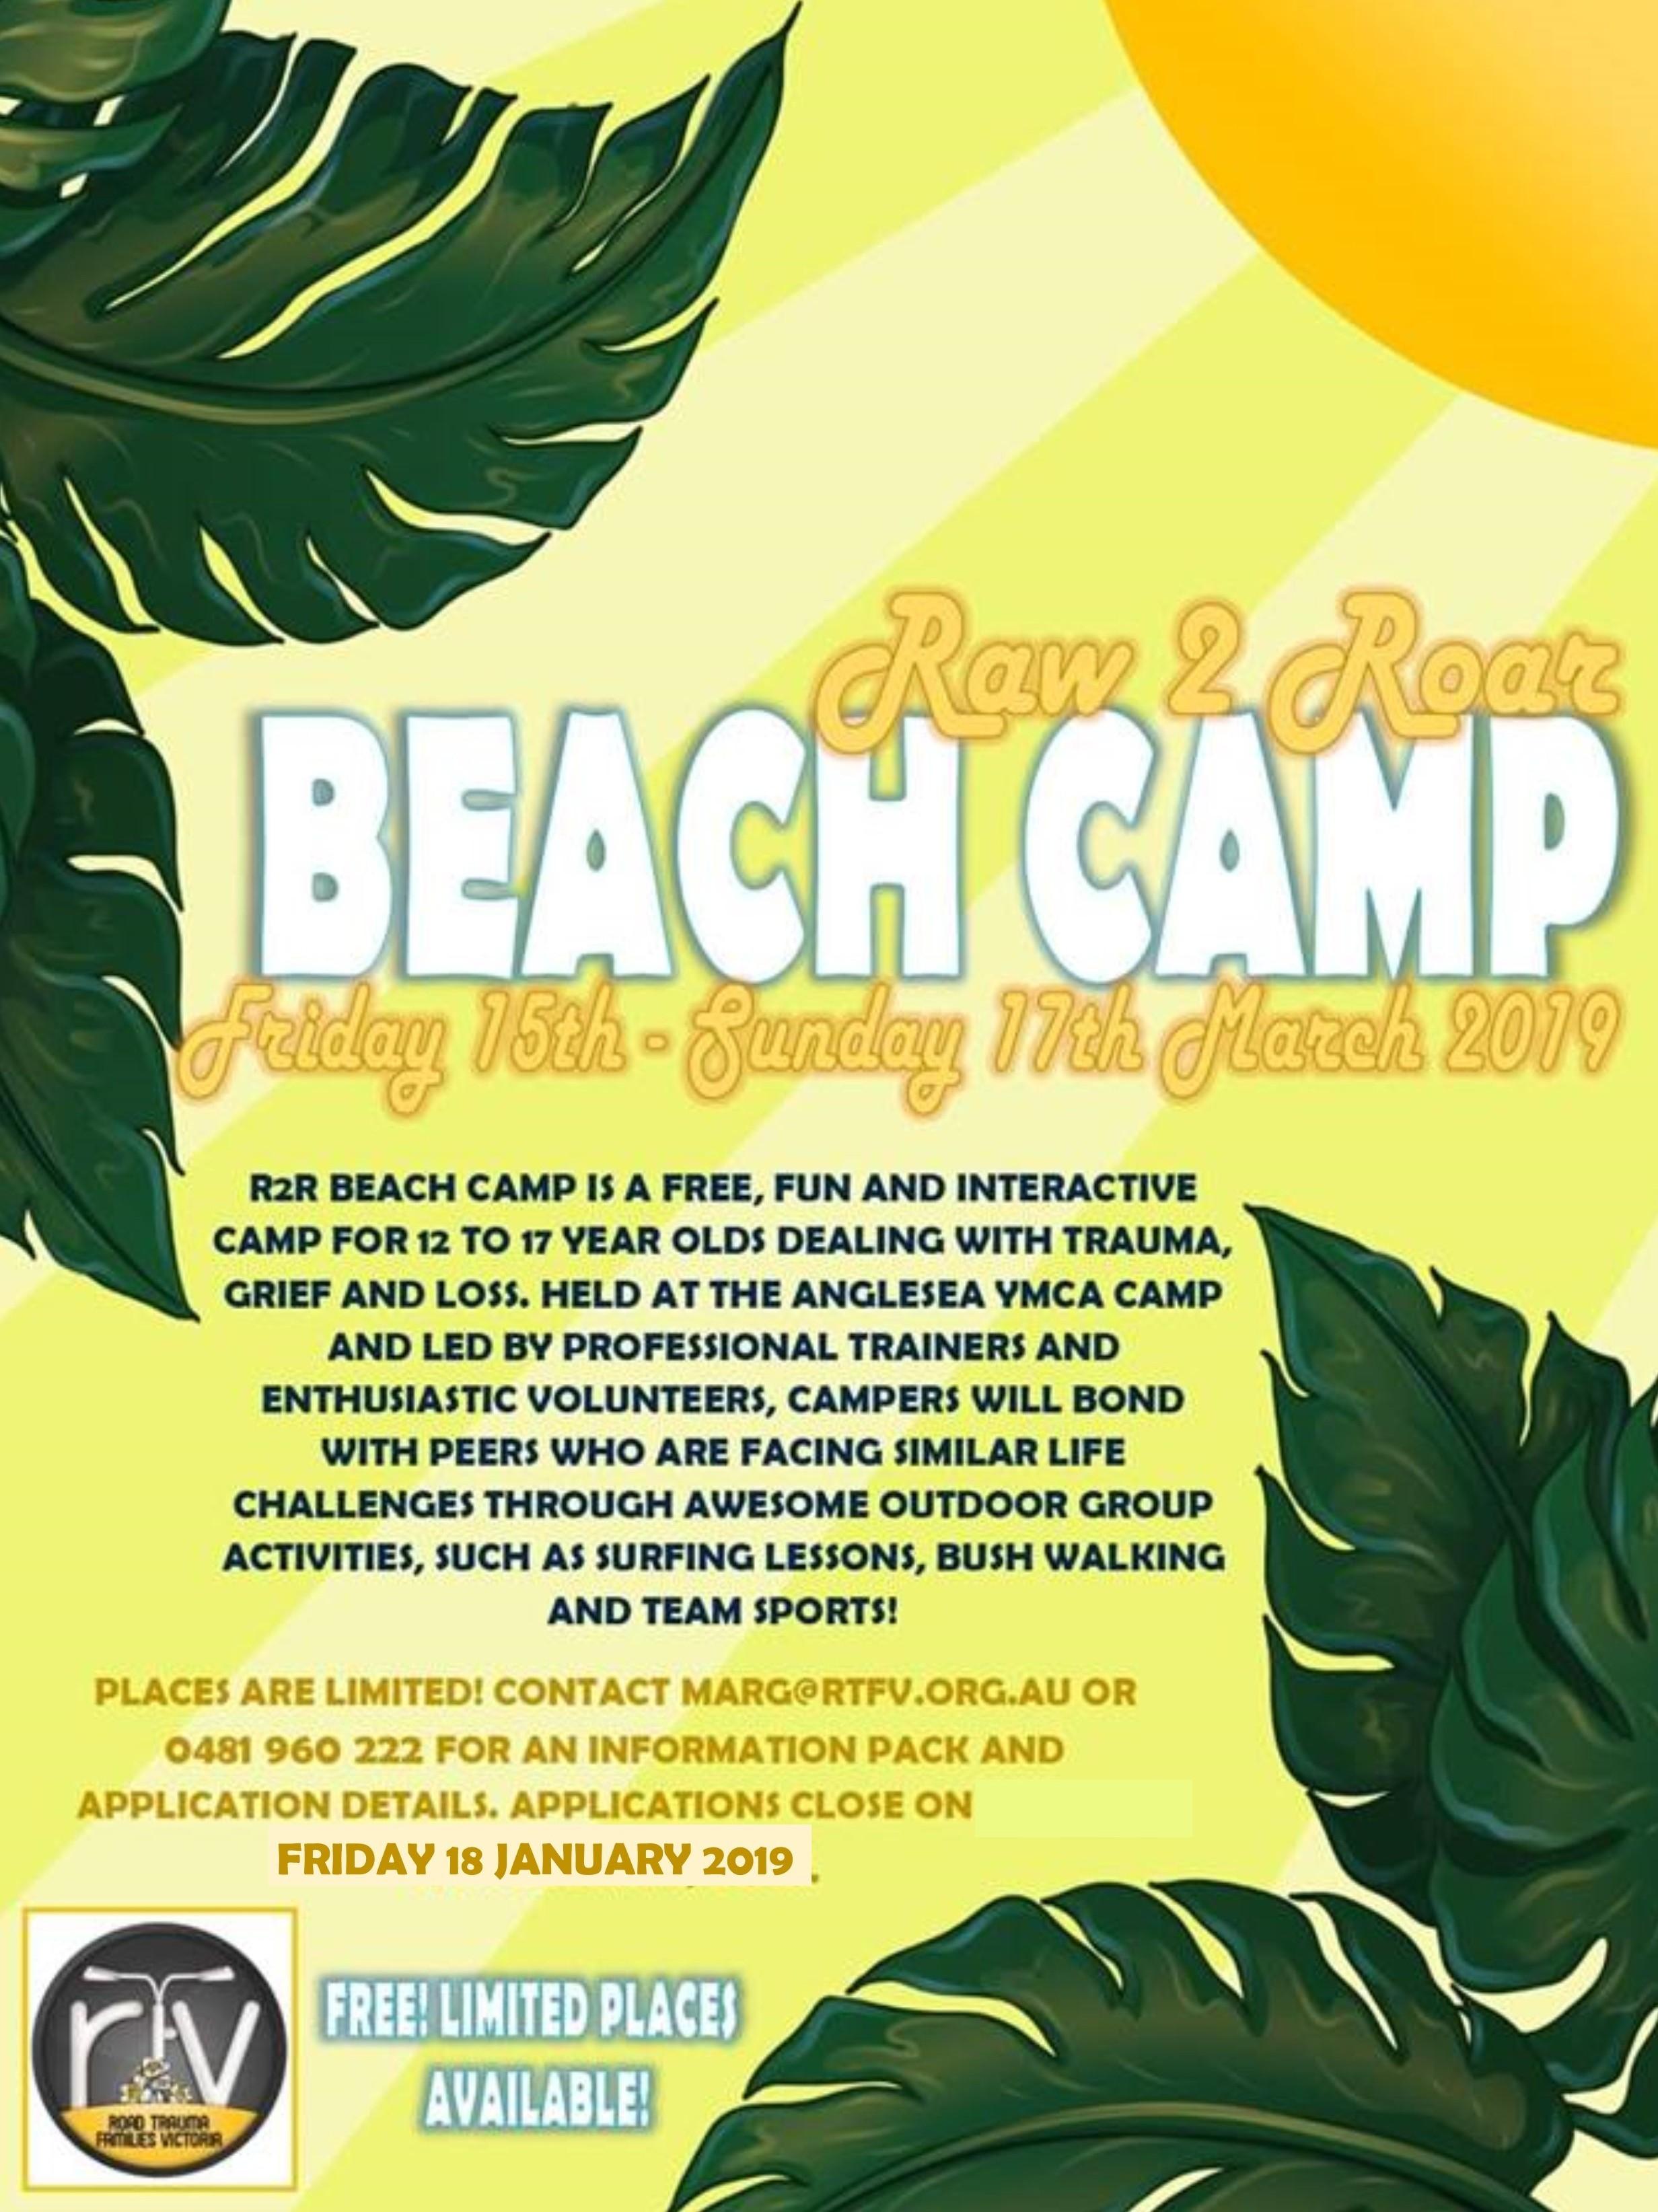 2019 Rtss Beach Camp Flyer